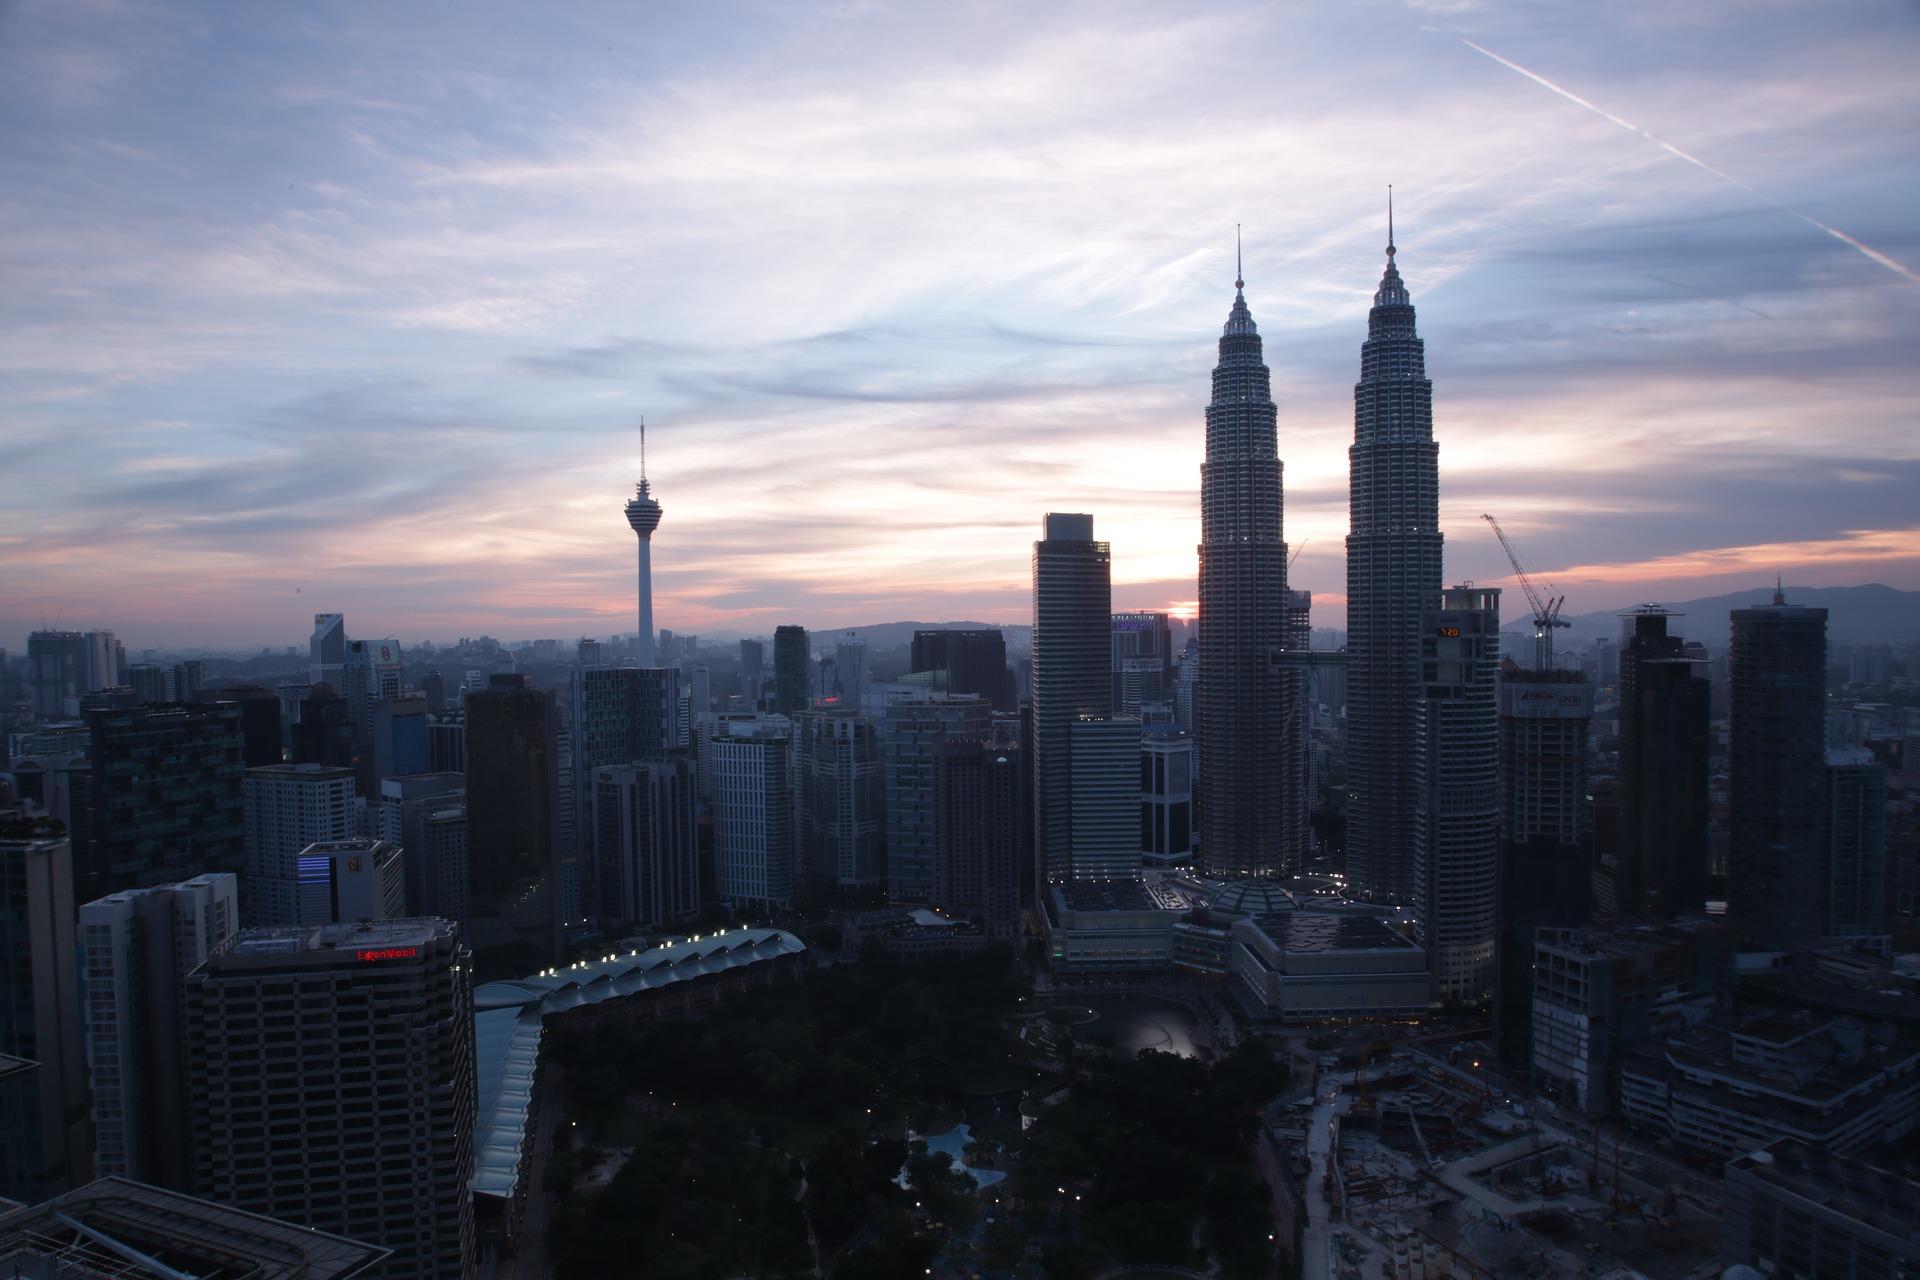 Kuala Lumpur - Real Estate Market Report